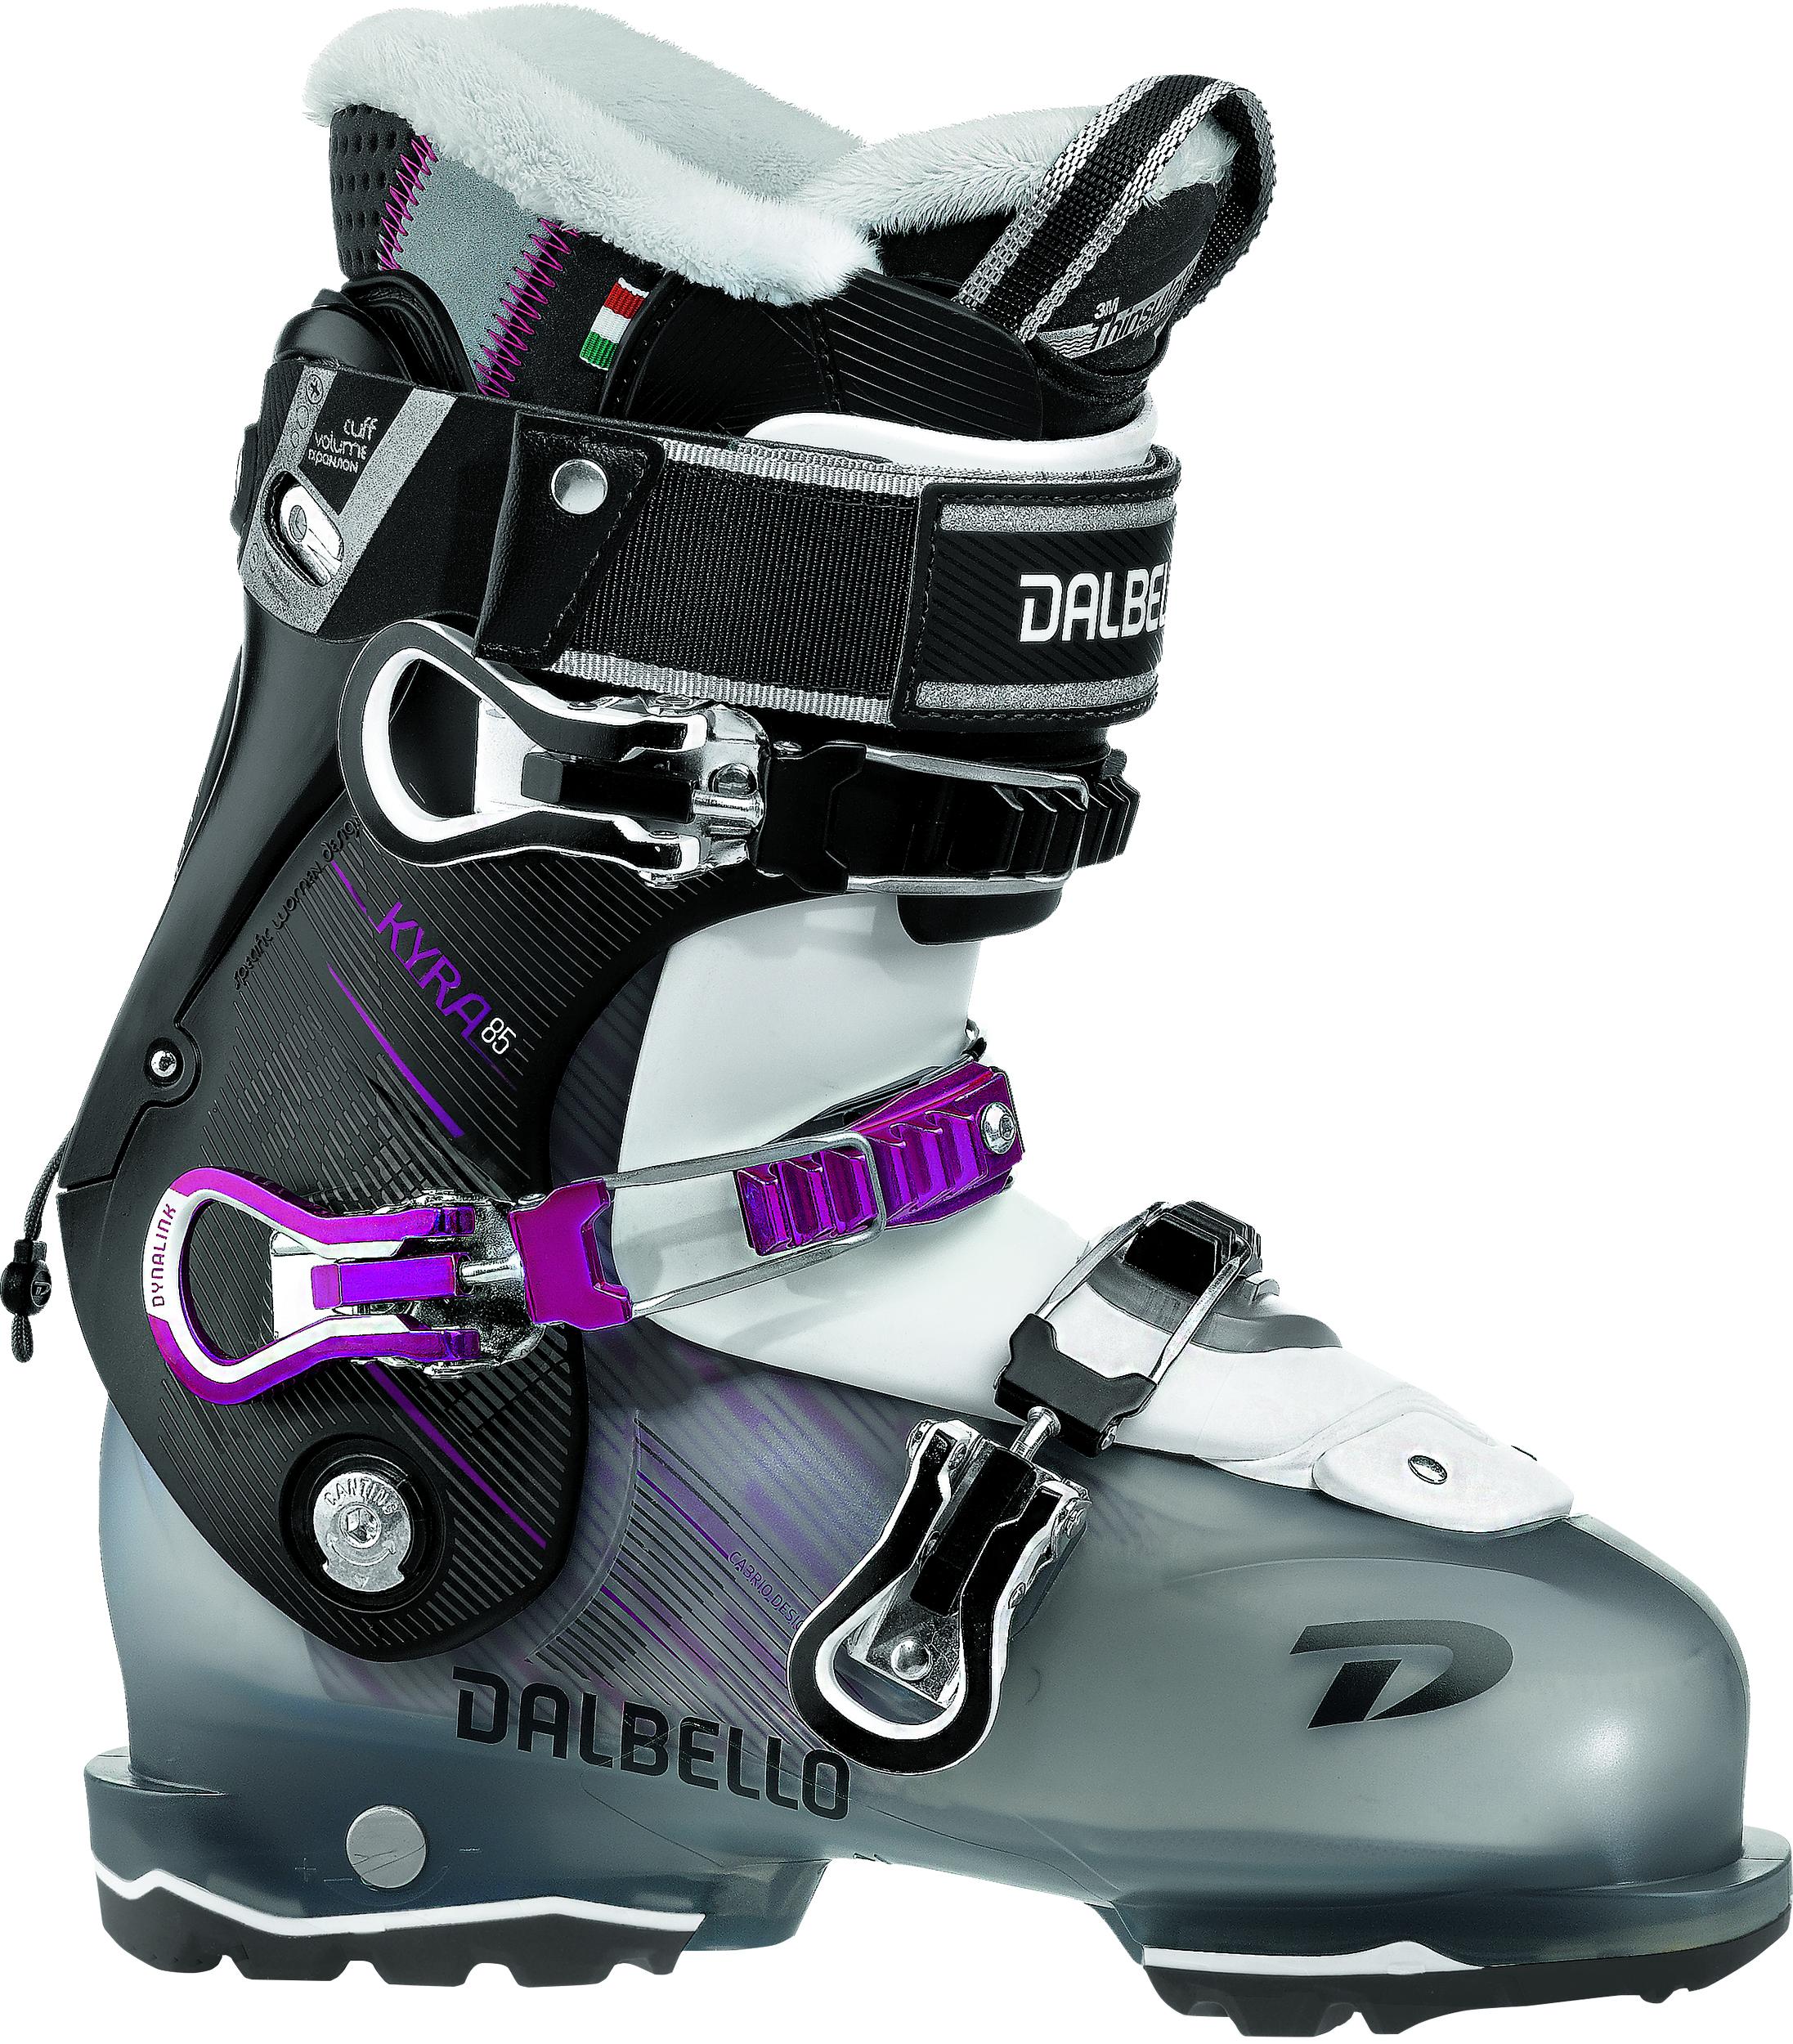 9c36e285bb Dalbello Kyra 85 GW Ski Boots - Women's